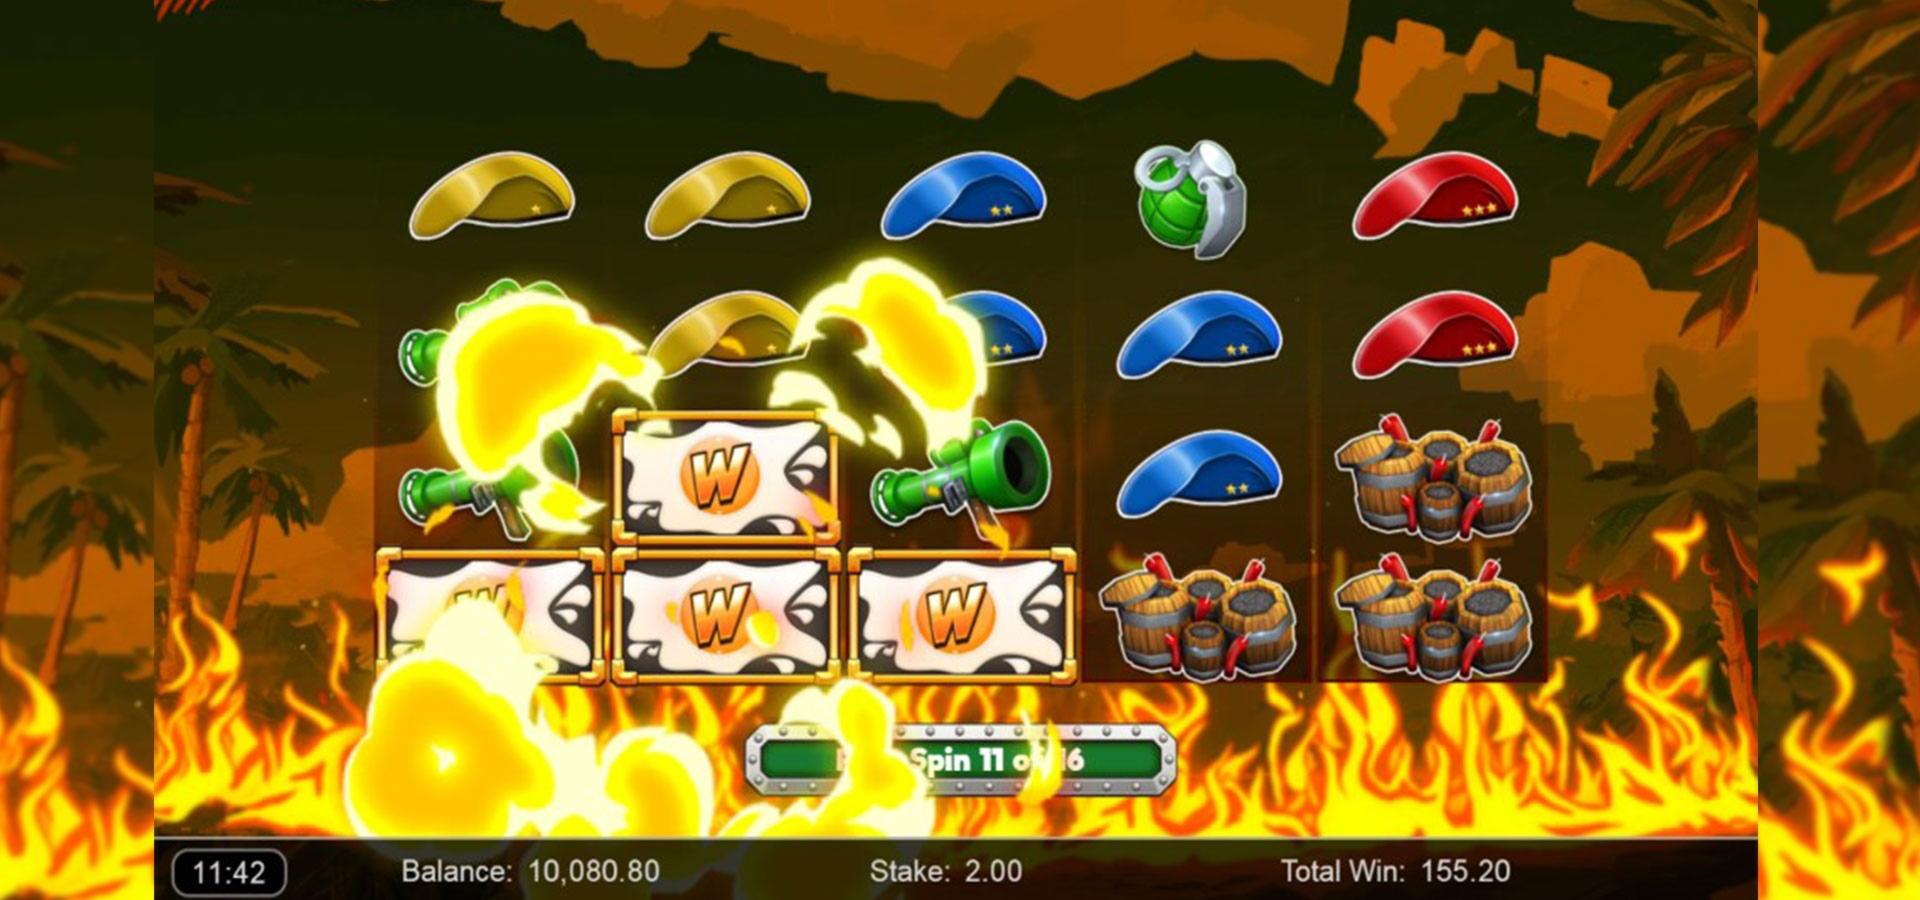 88 free spins no deposit casino at Sloto Cash Casino